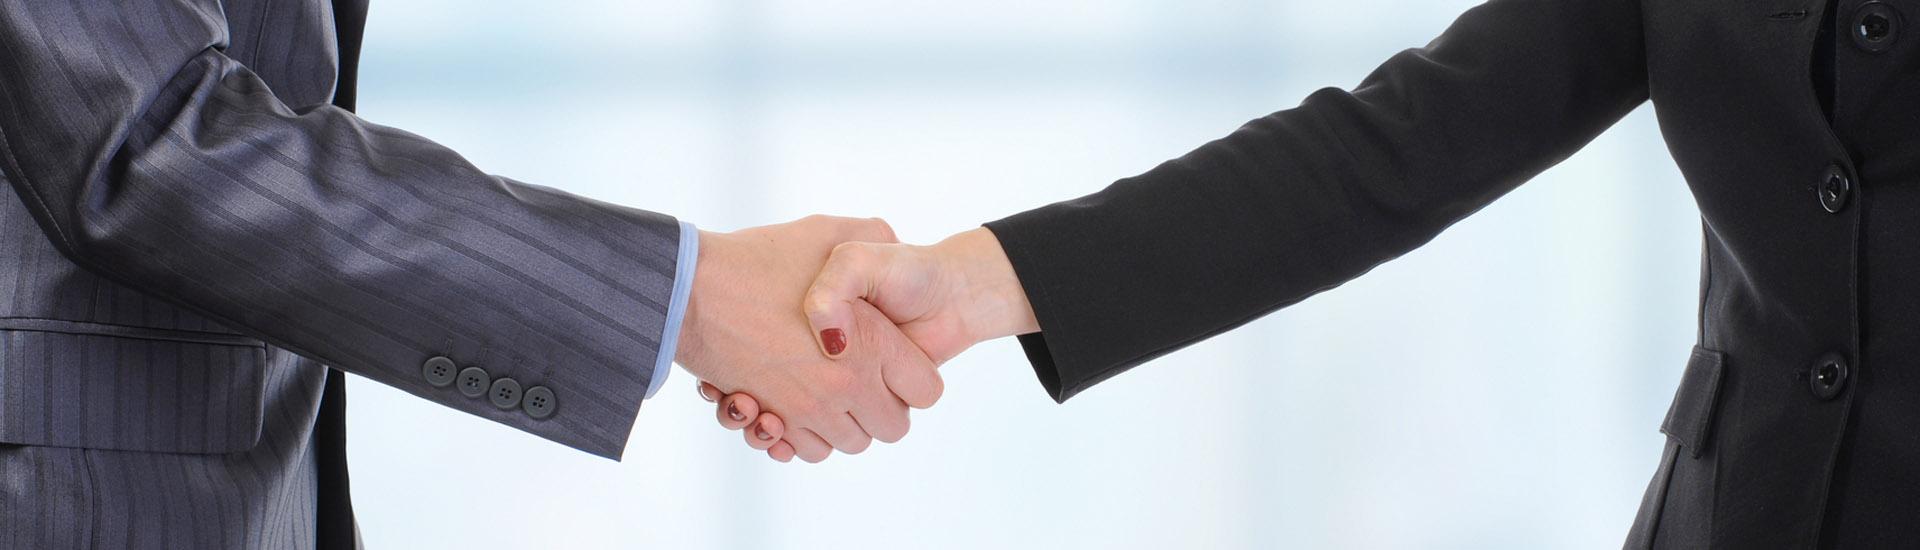 handshake-2a